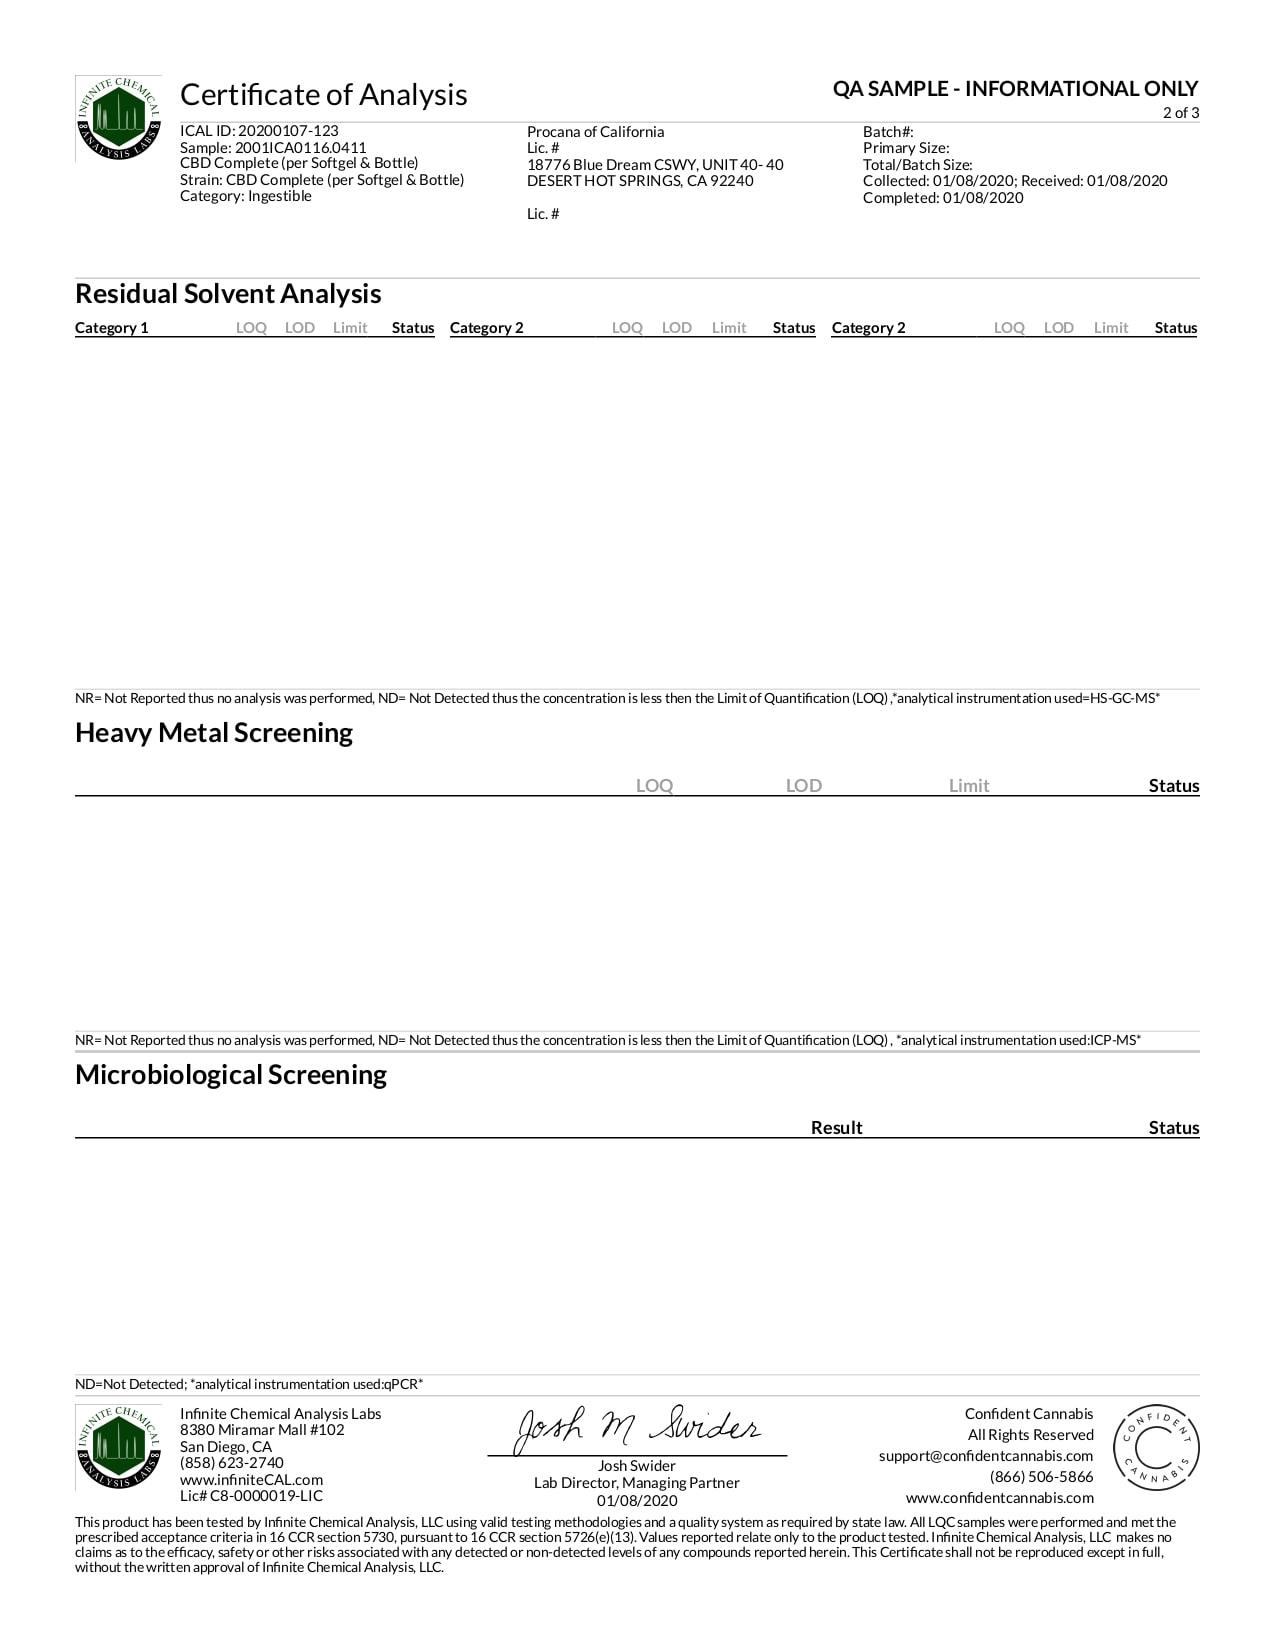 Procana CBD Complete Softgels 600mg Lab Report